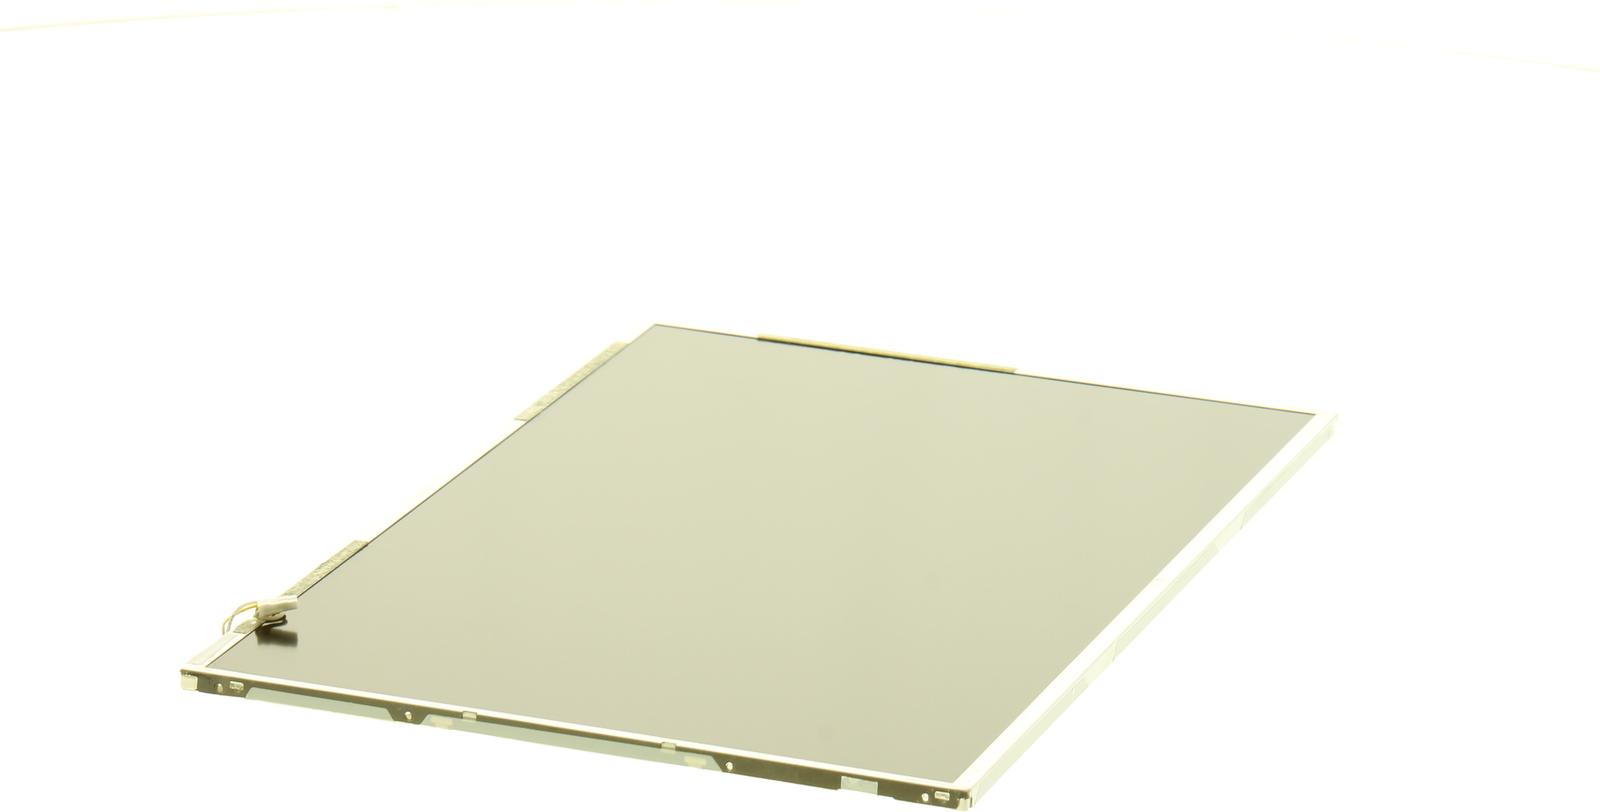 IBM LCD panel 15.4-in. WSXGA+, LG **Refurbished** 13N7020-RFB - eet01